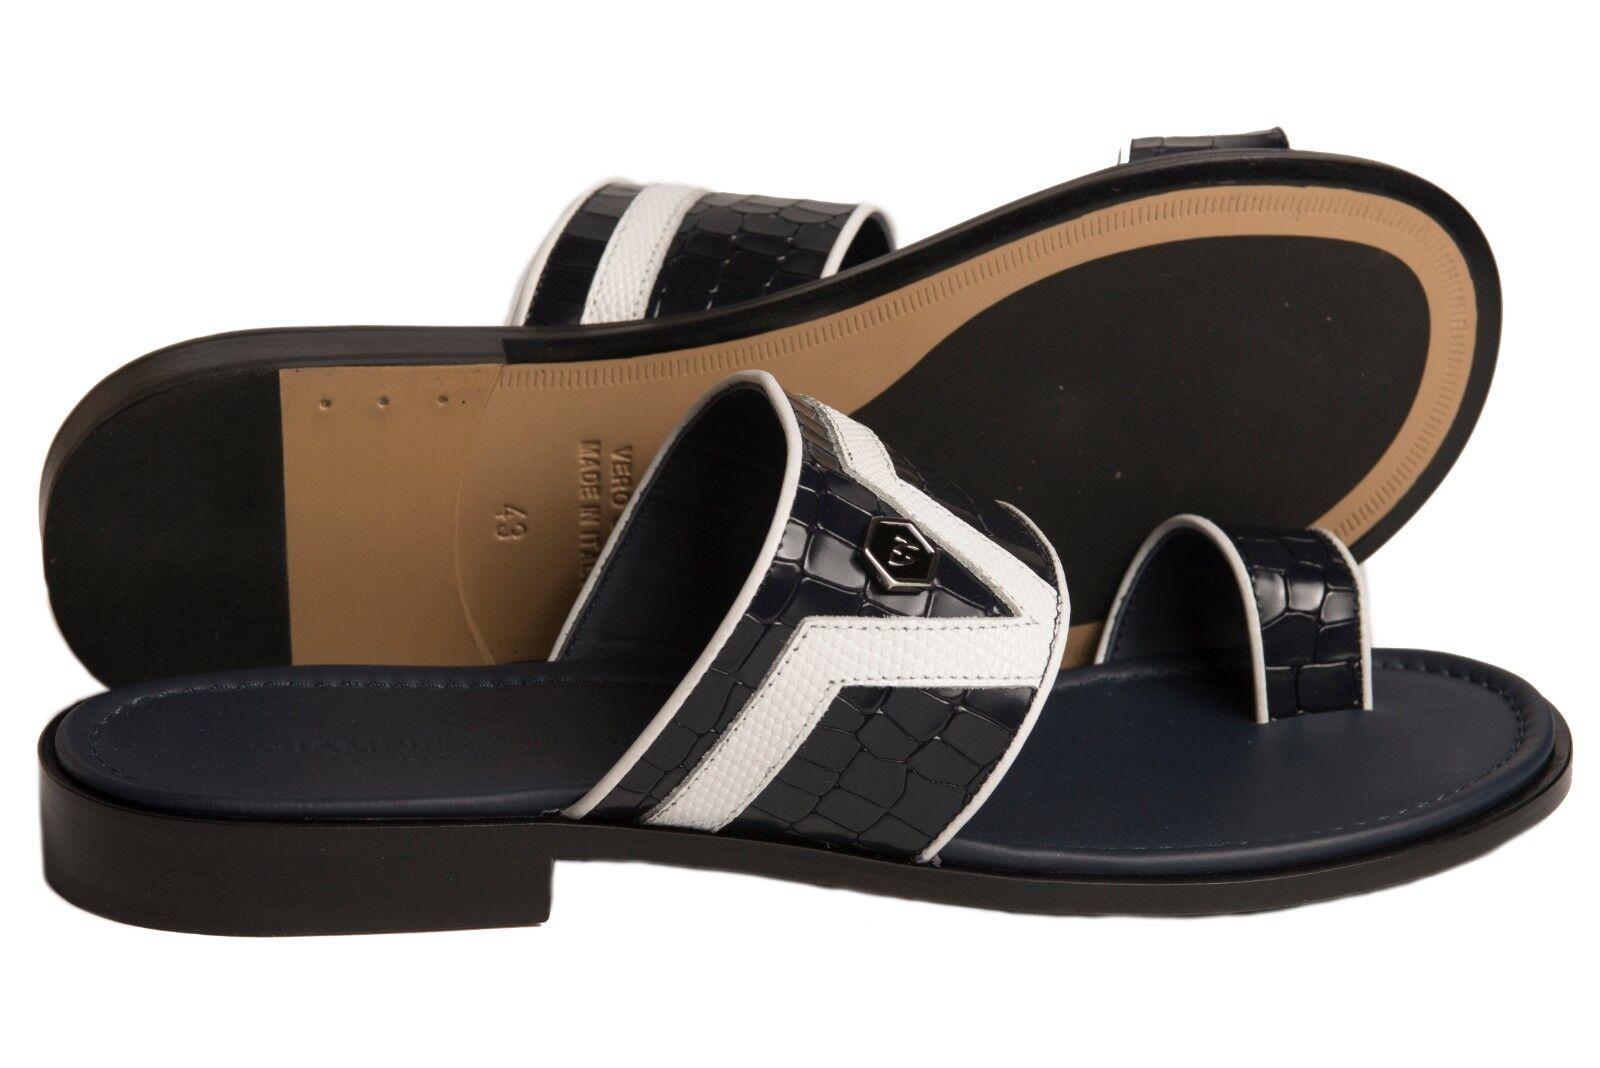 Giampieronicola 5396 Italian mens navy blu, bianca leather push-in-toe sandals